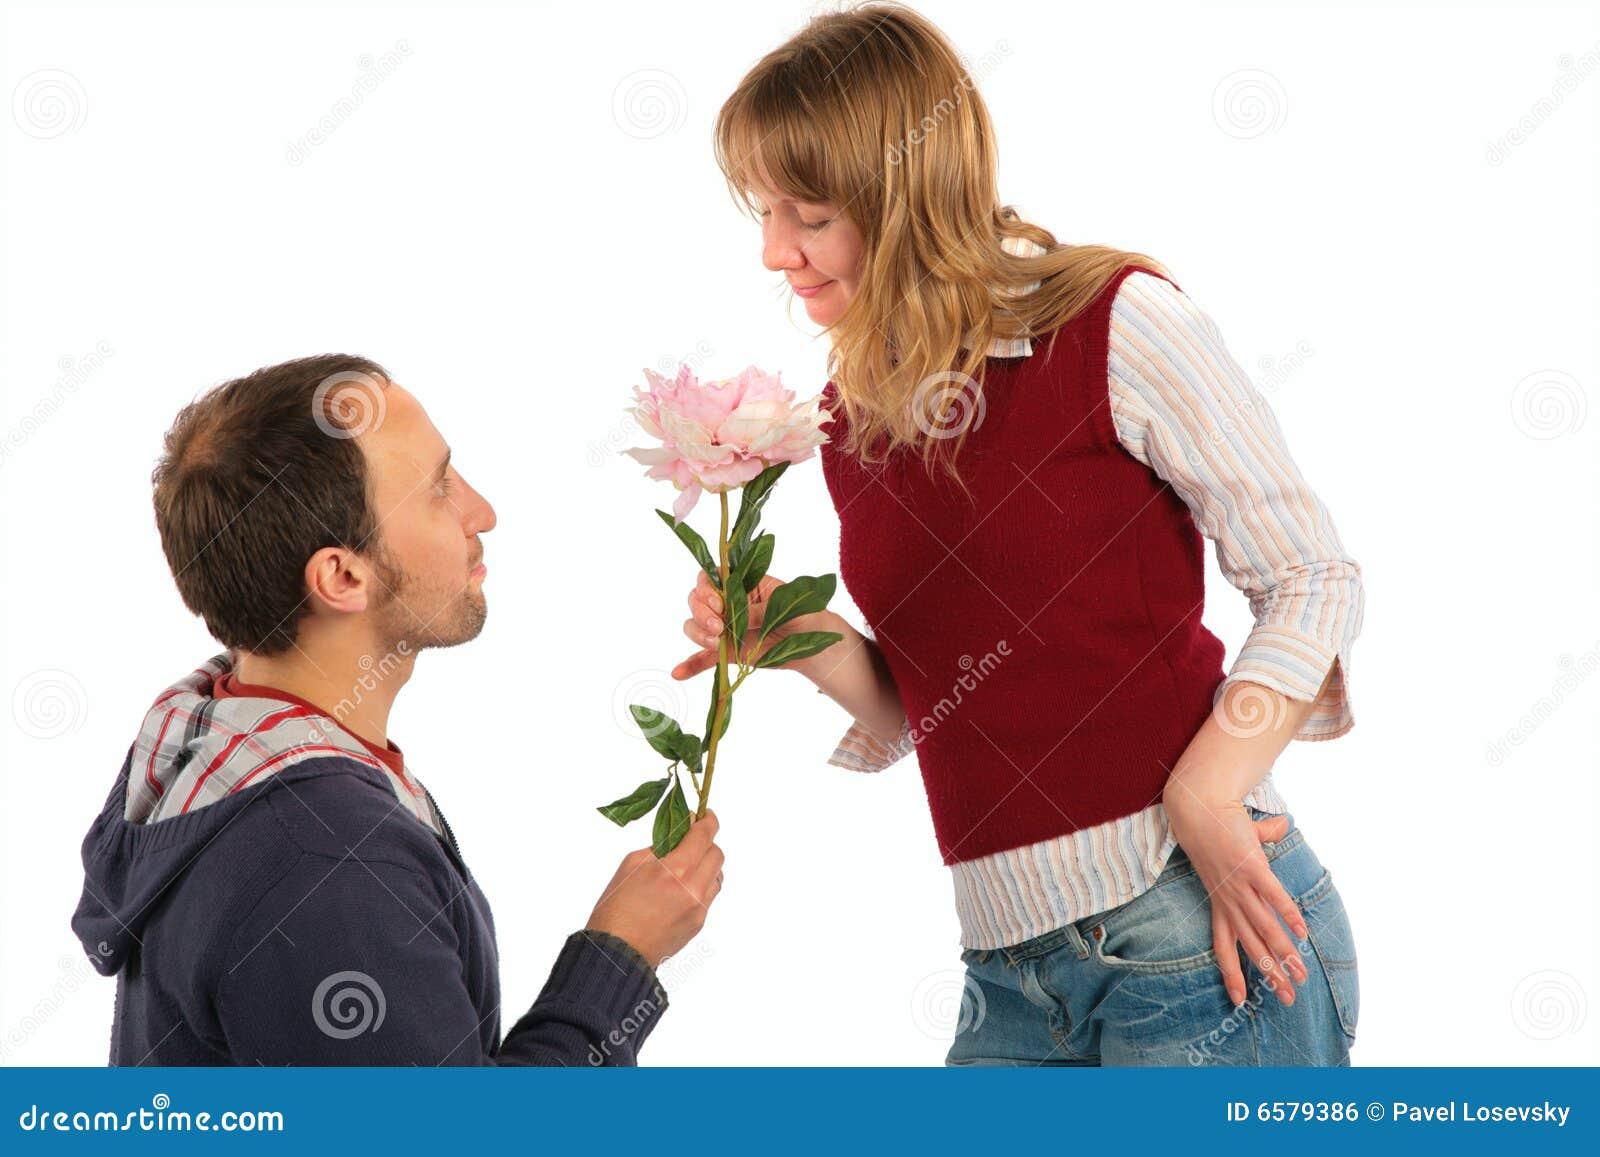 Mann gibt der Frau Blume